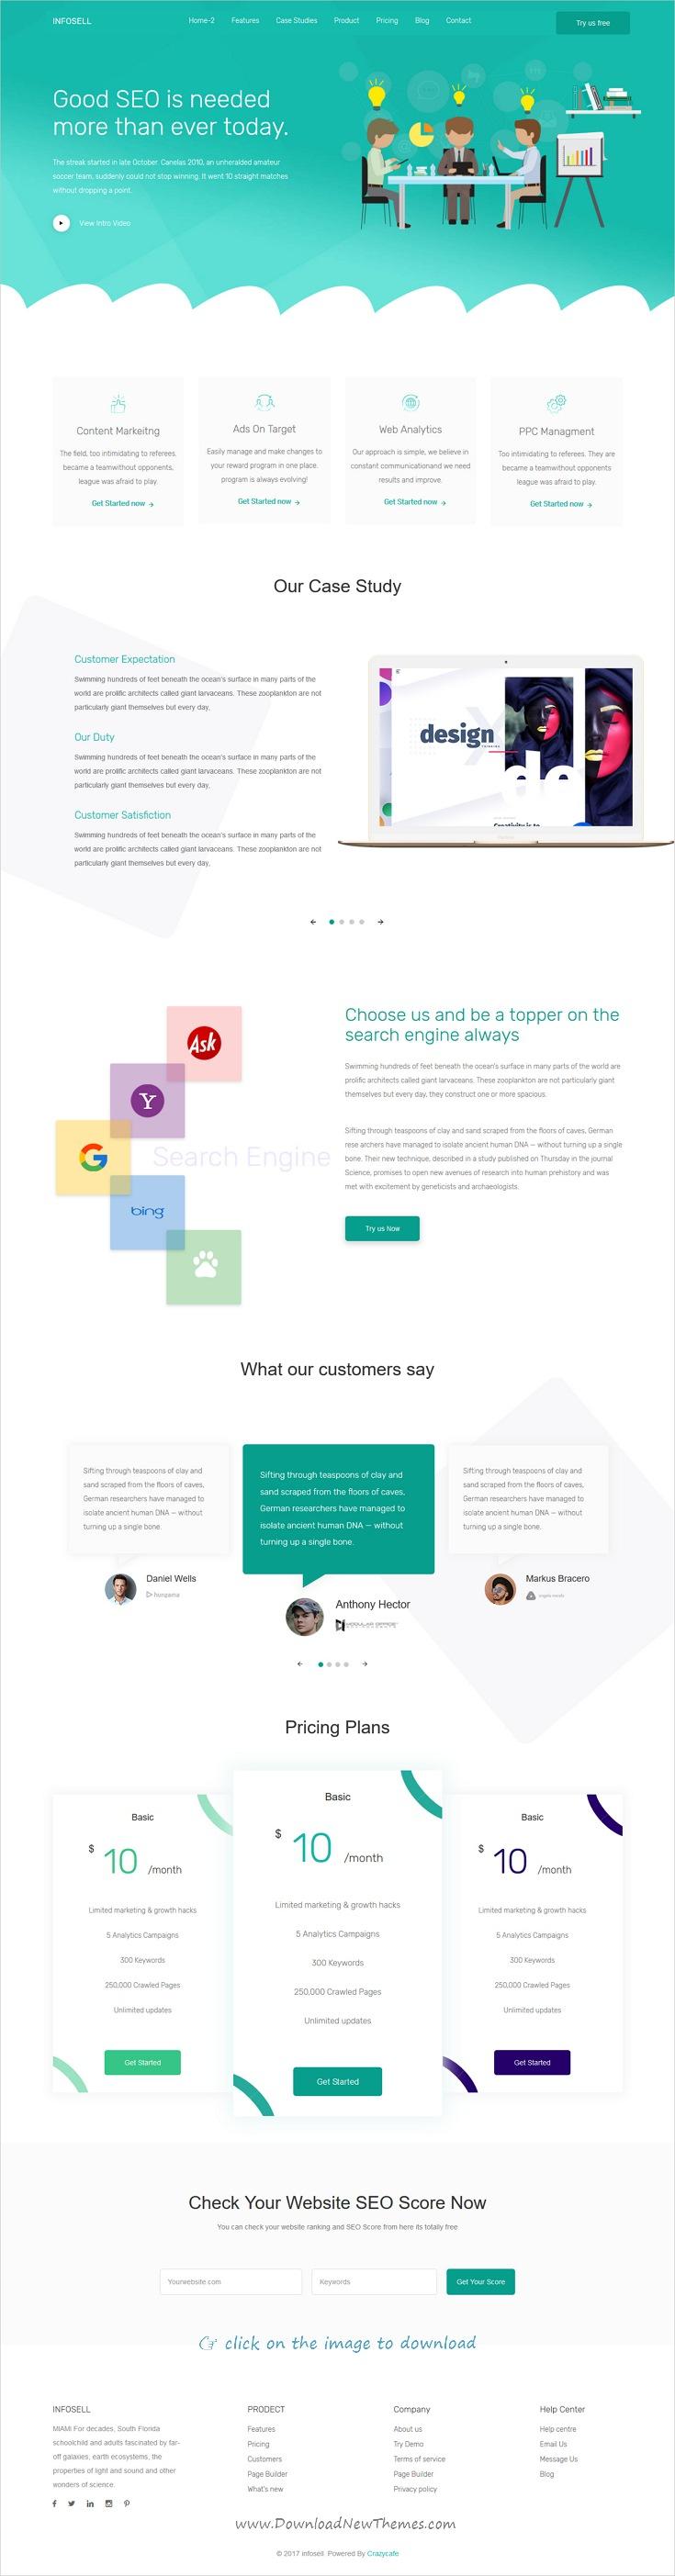 Infosell - Marketing HTML5 Template | Template